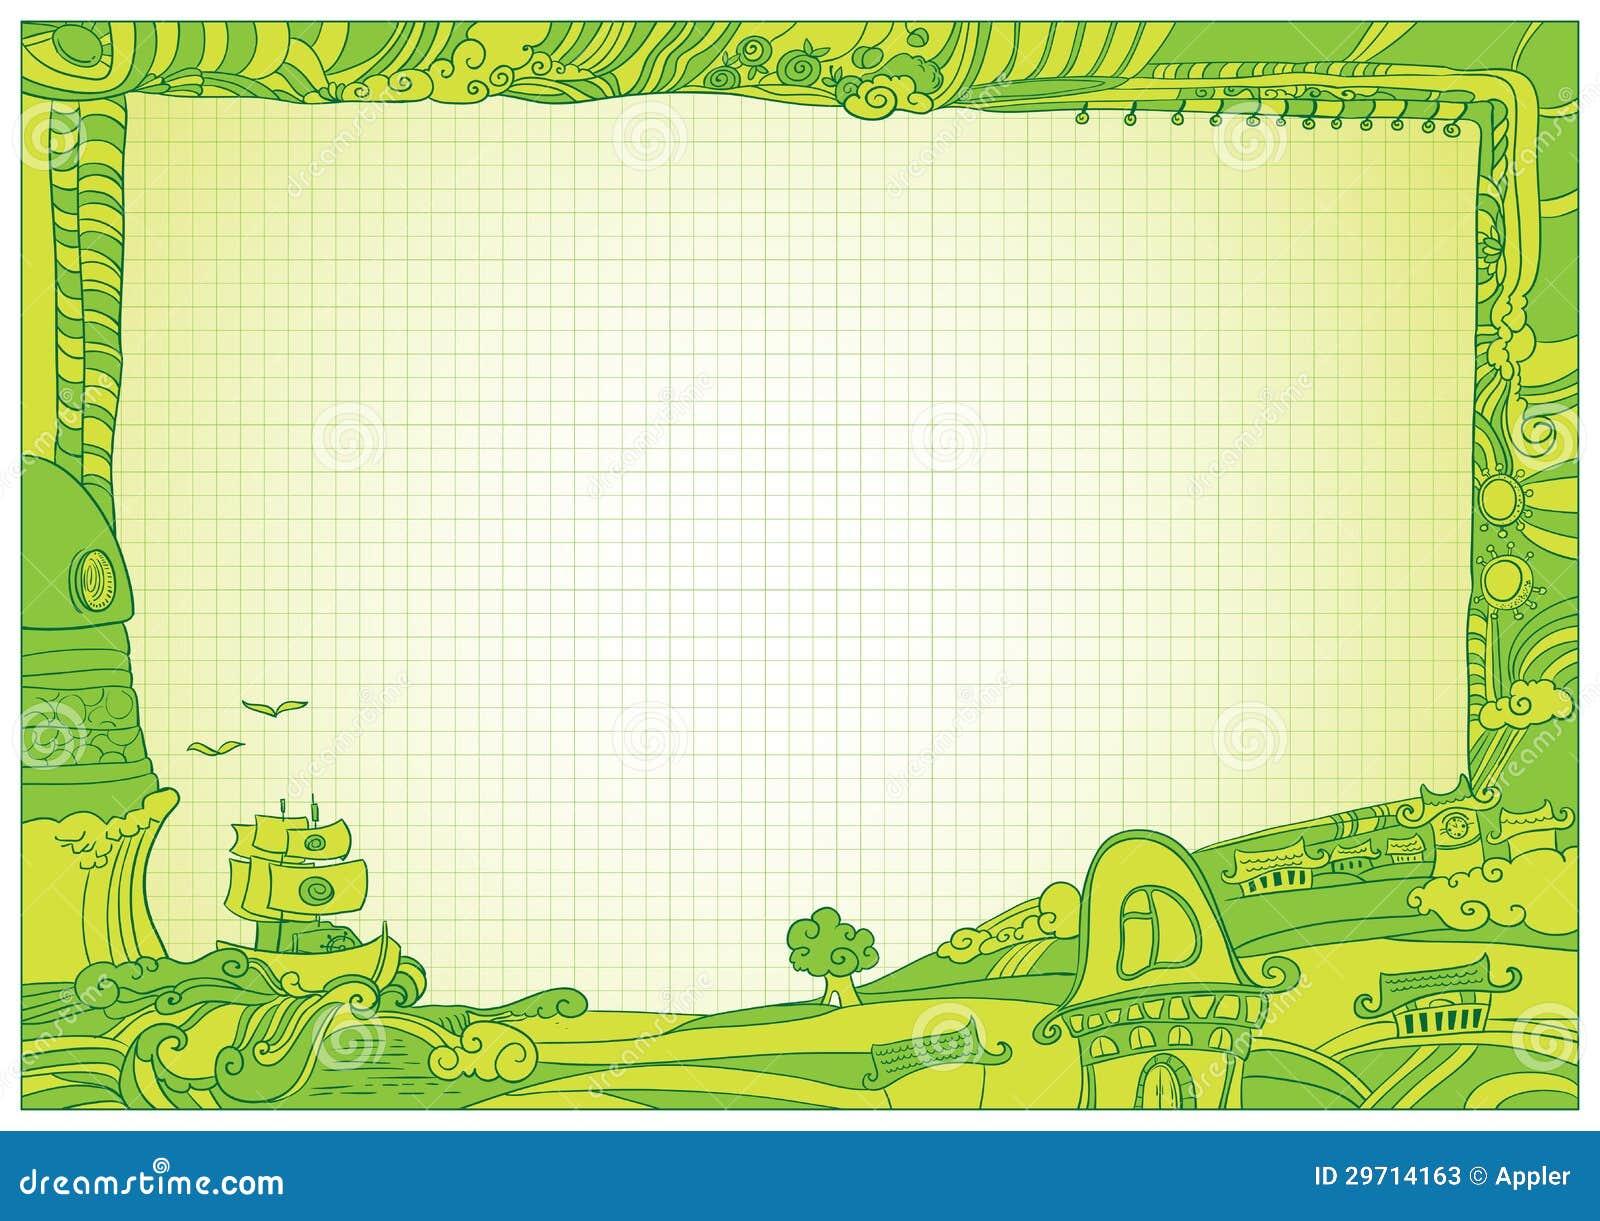 Ejemplo Del Marco Del Diploma Del Estilo Del Doodle Stock de ...